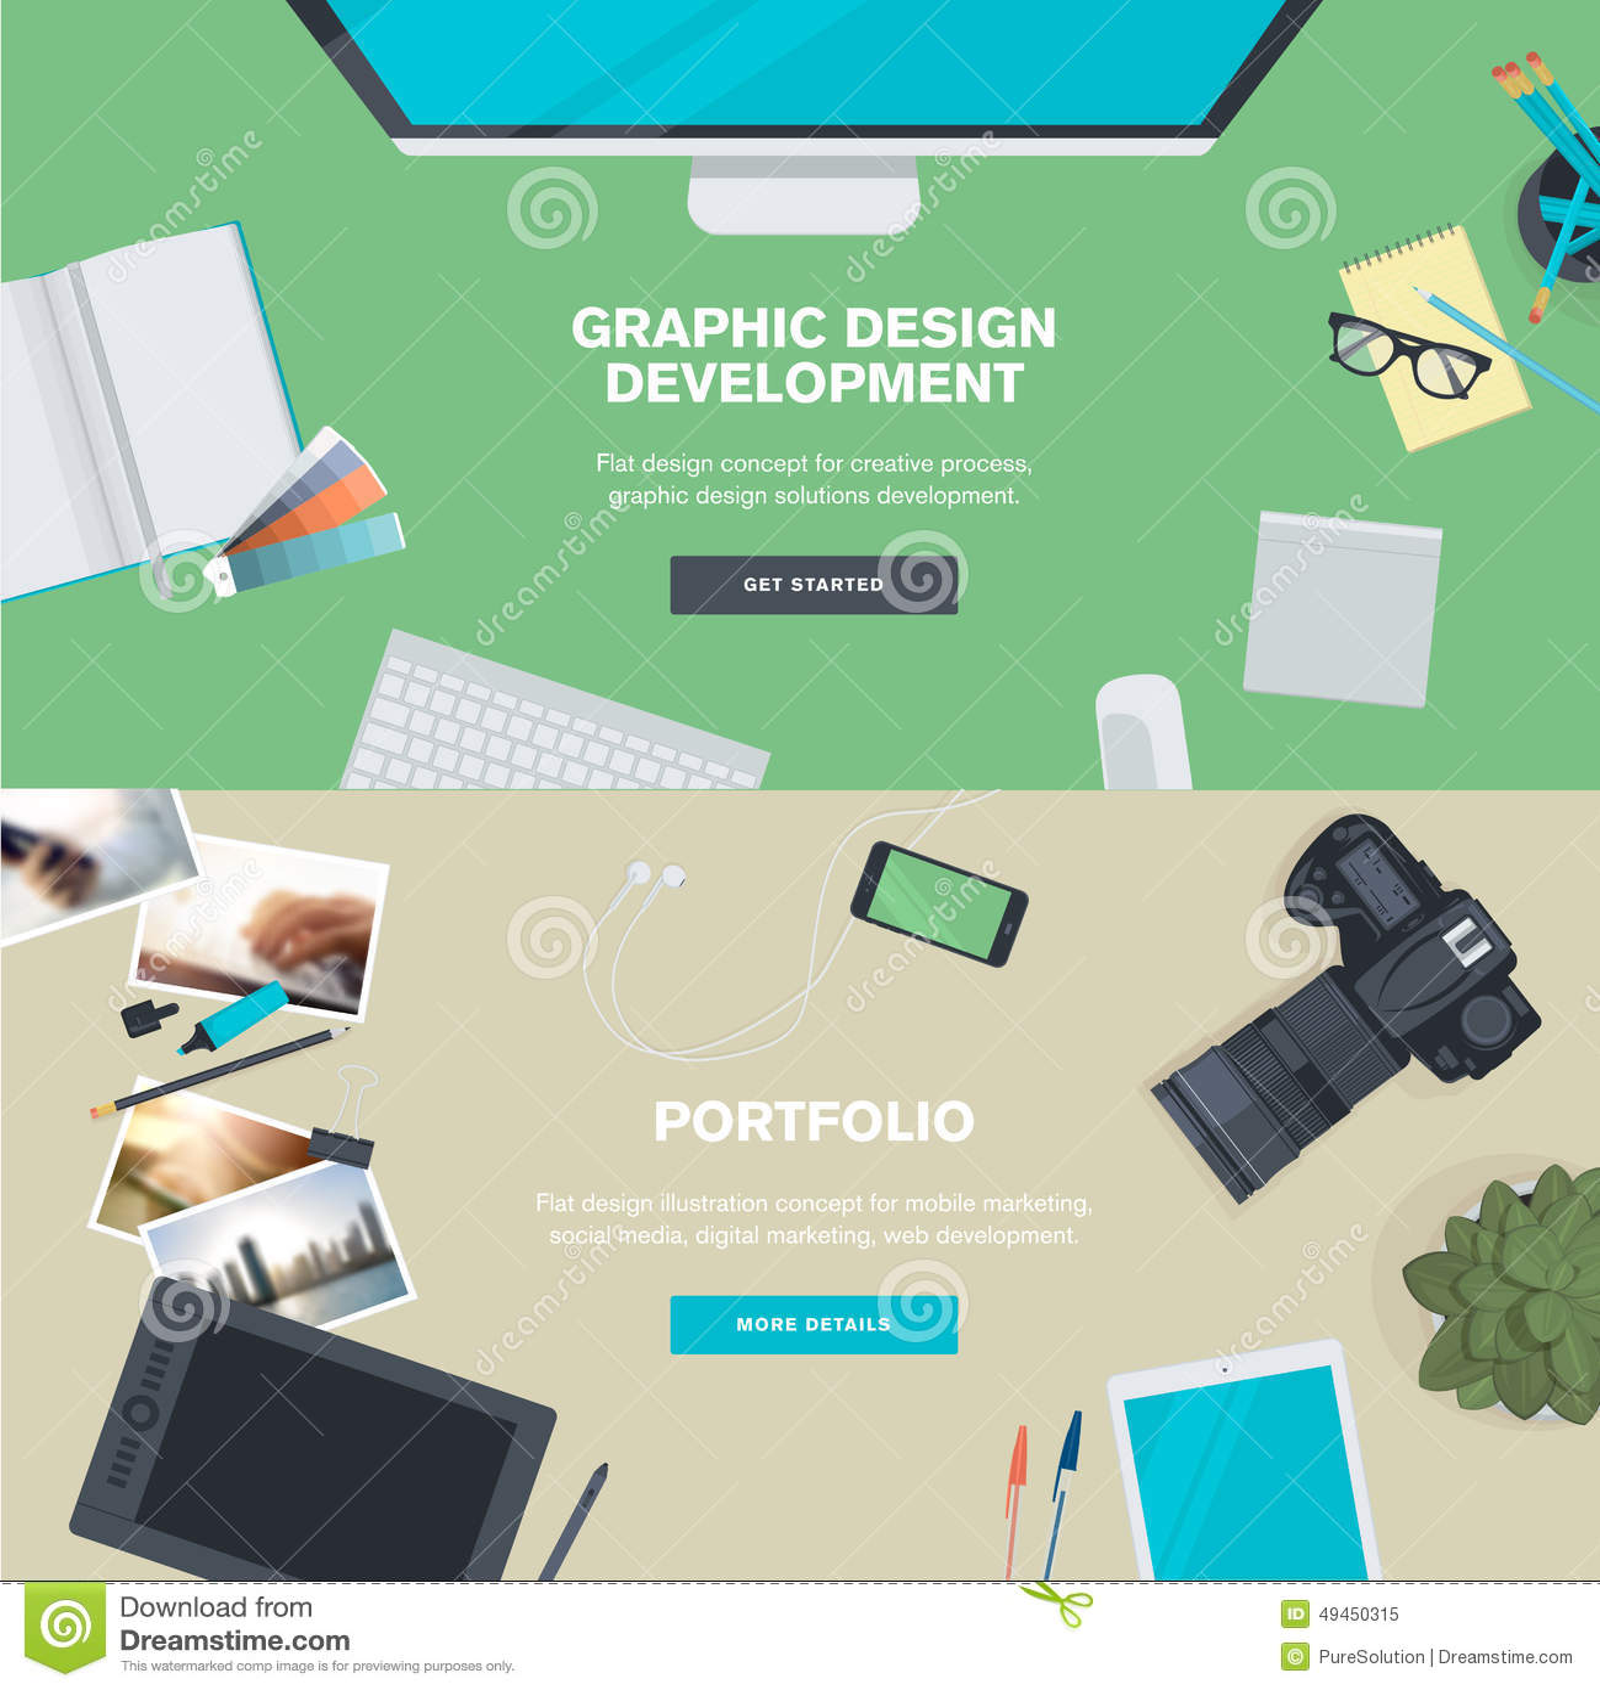 Set Of Flat Design Illustration Concepts For Graphic